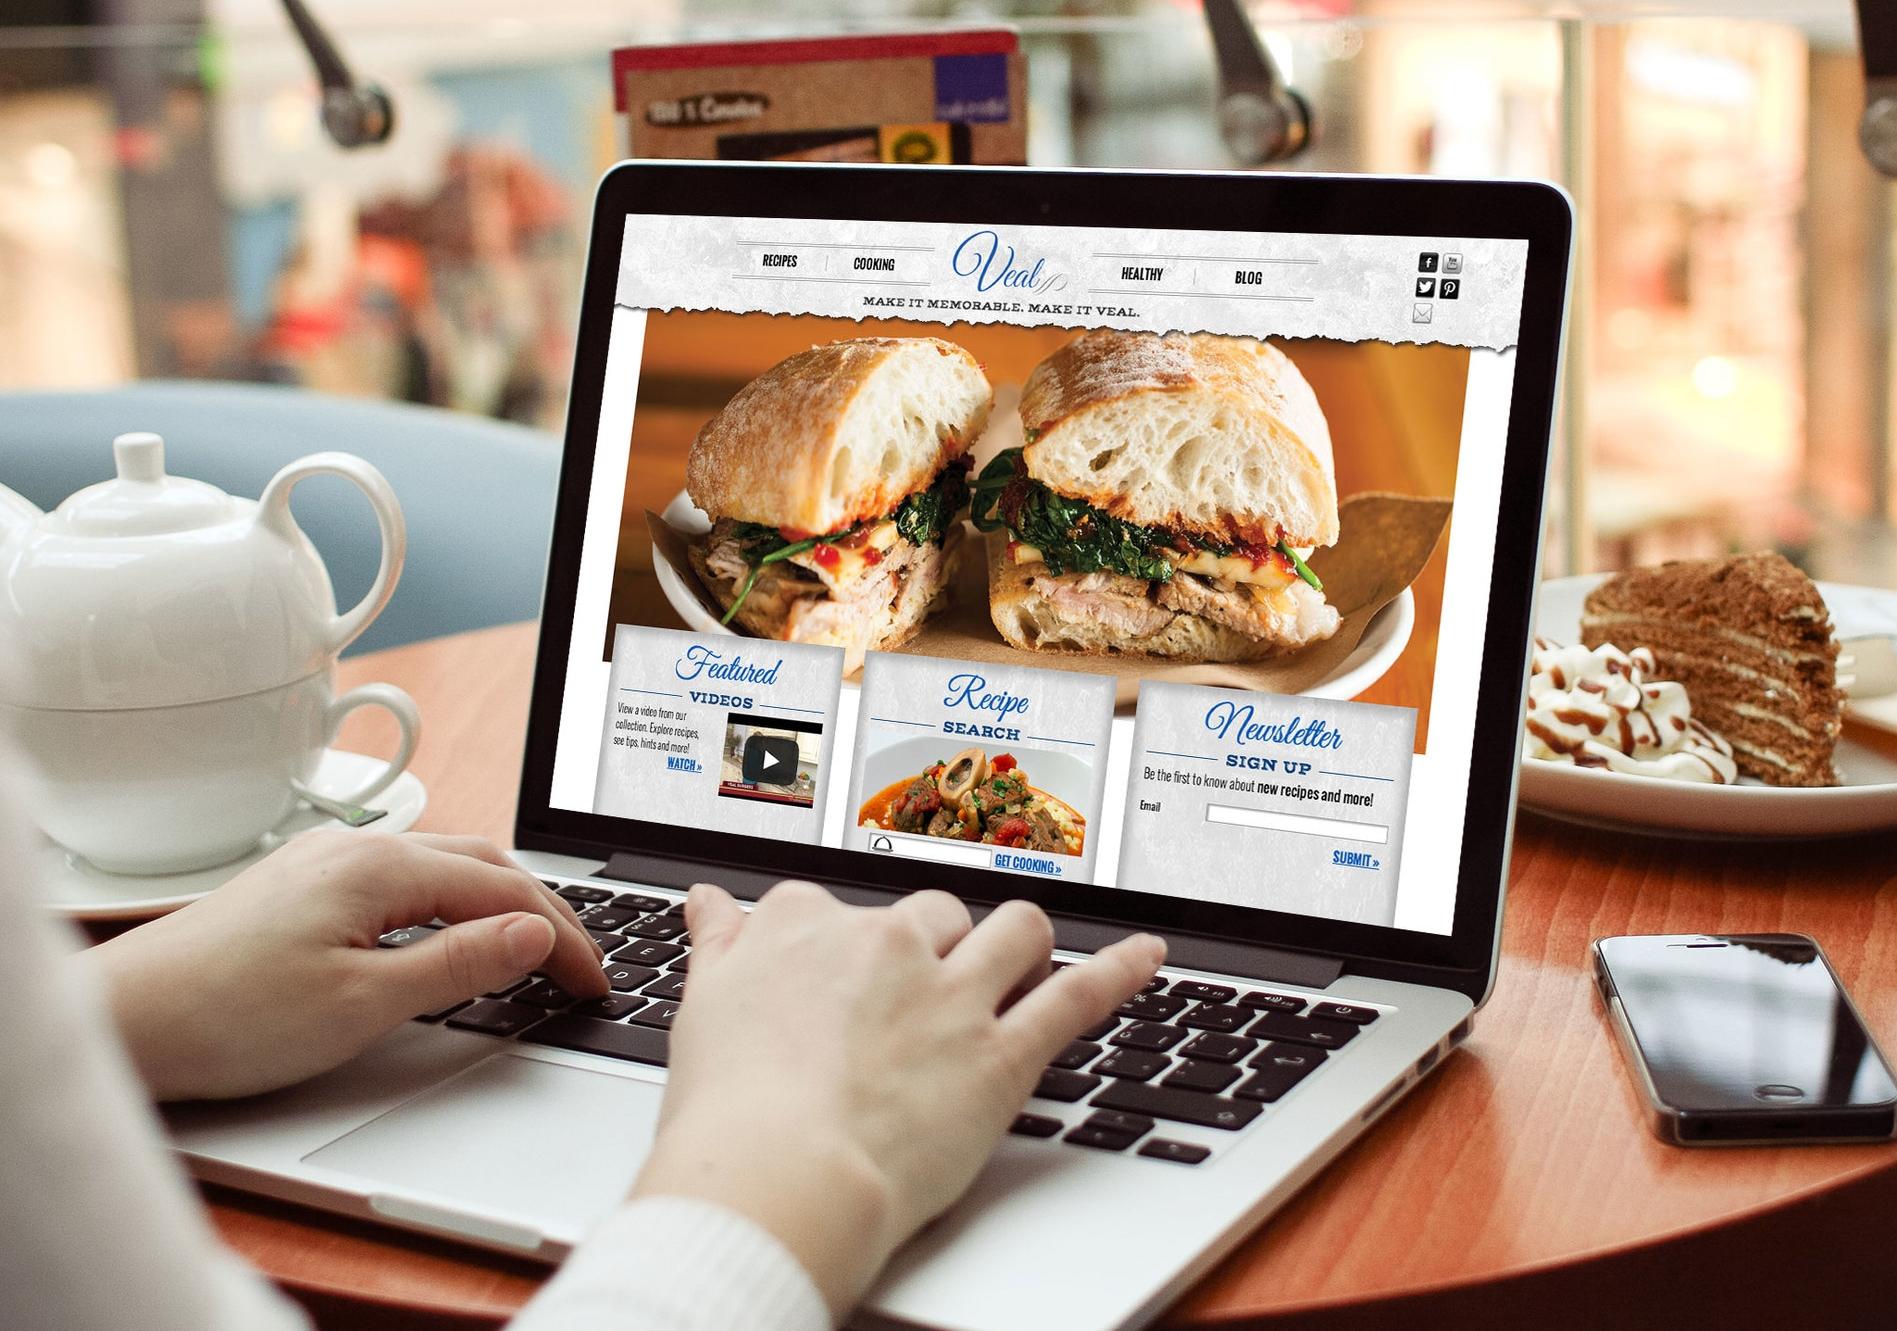 MacBook-Pro-PSD-Mockup_vealmadeeasy.jpg